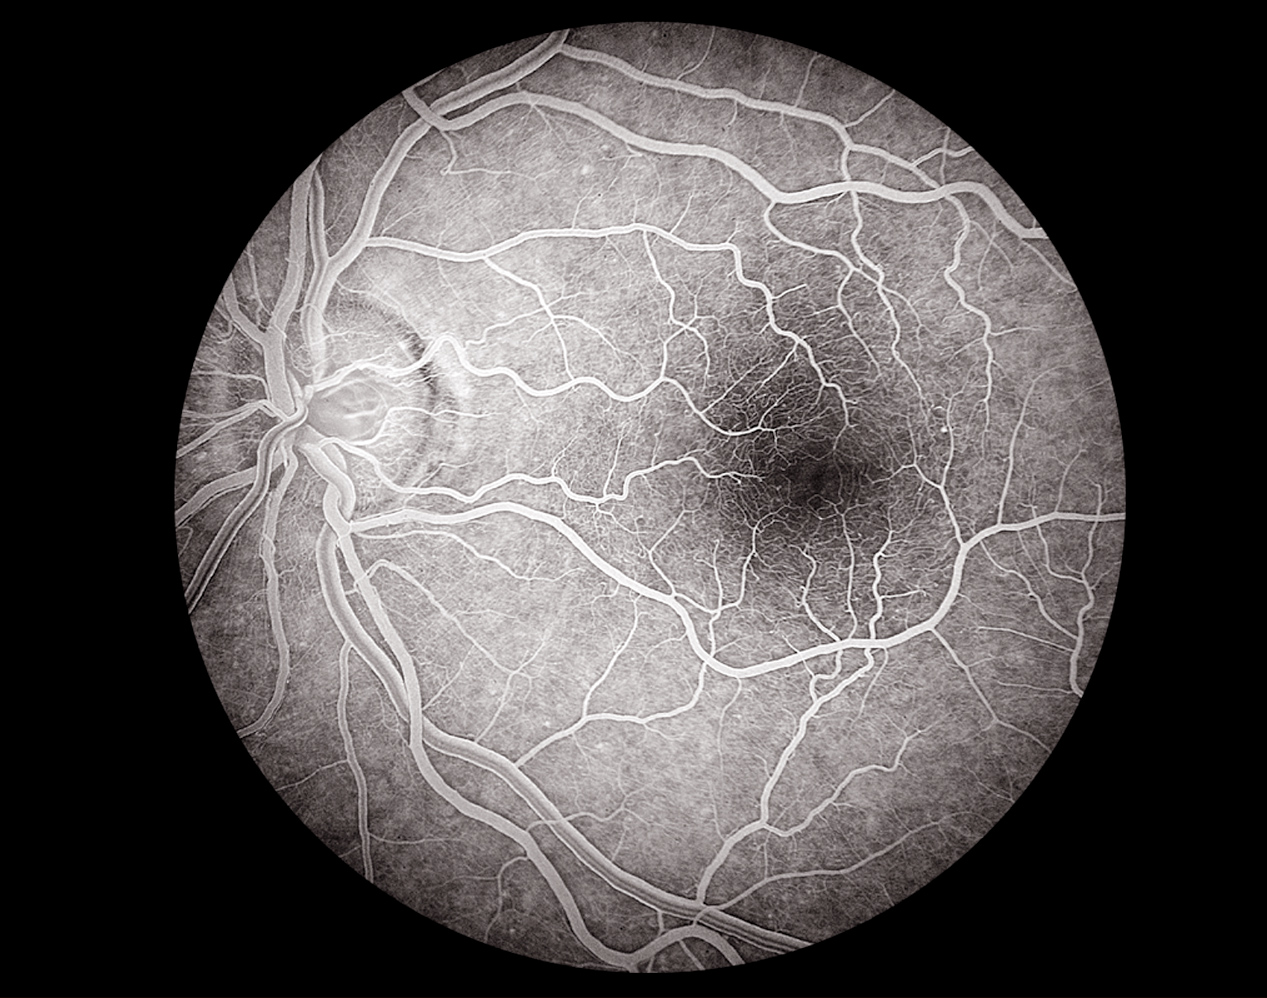 © Mark Maio 30 Degree View Left Eye Optic Nerve and Fovea Angiogram.jpg